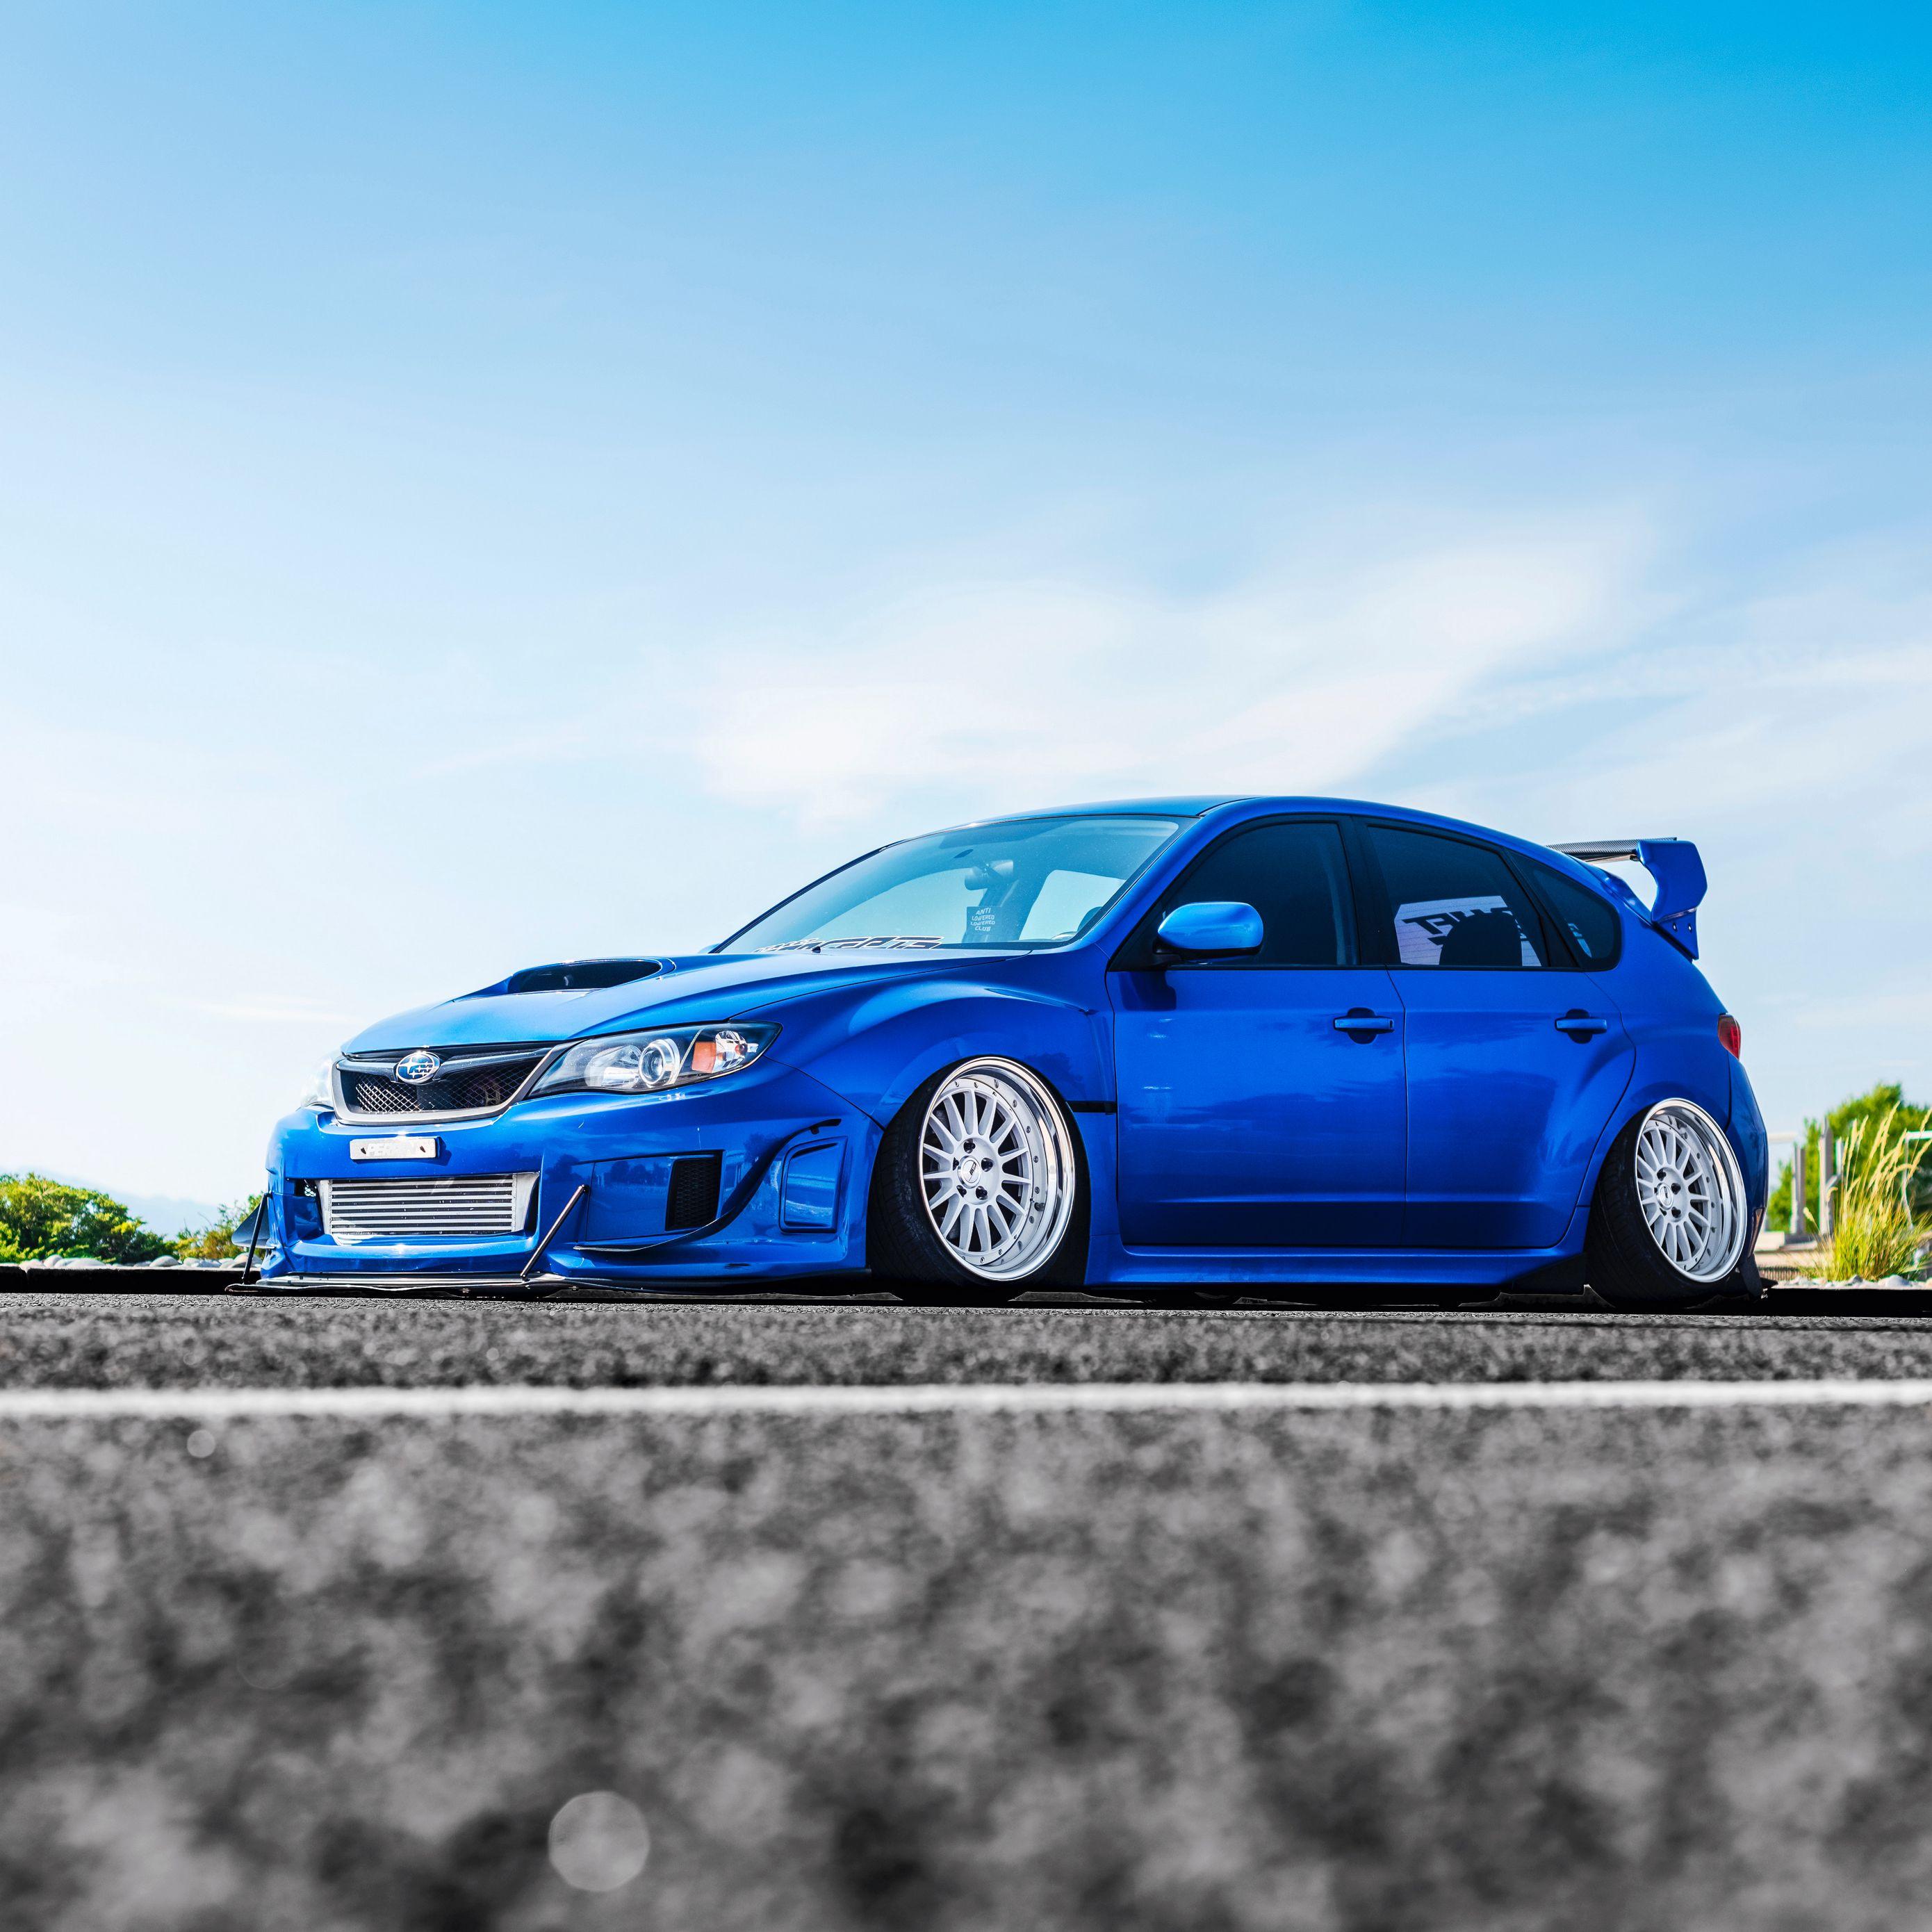 2780x2780 Wallpaper subaru, car, blue, side view